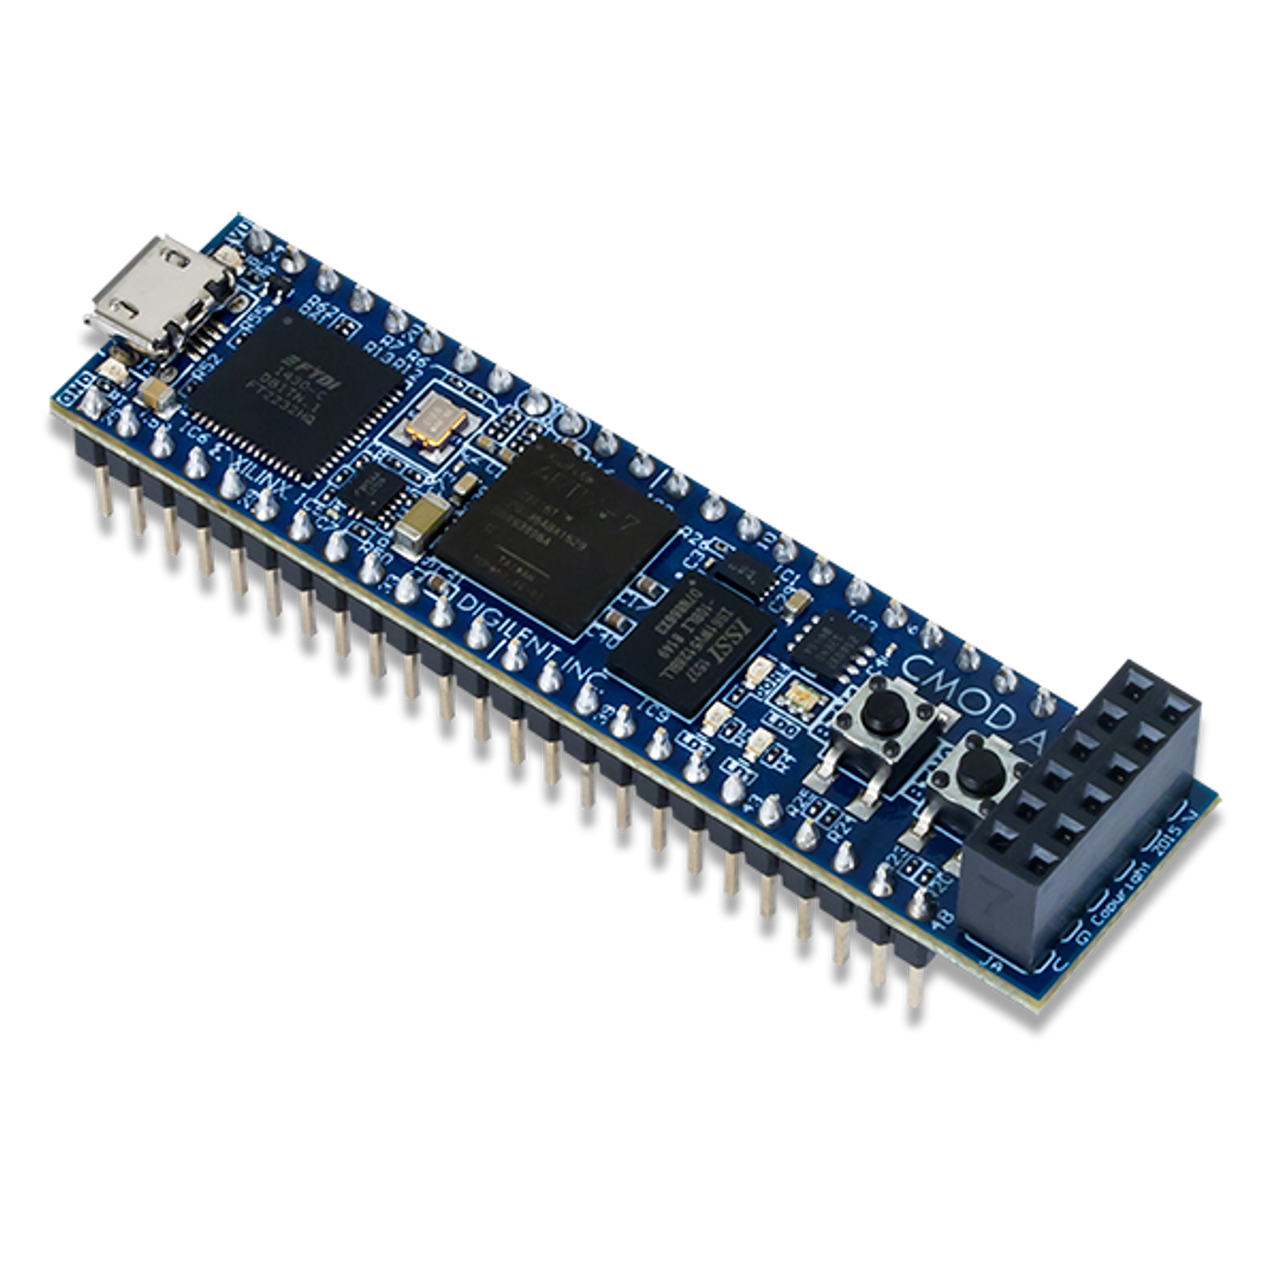 Cmod A7:Xilinx Artix-7 開發板 │  最小系统萬用電路板 │ 美國網友五星好評  │  A7-15T A7-35T 雙版本